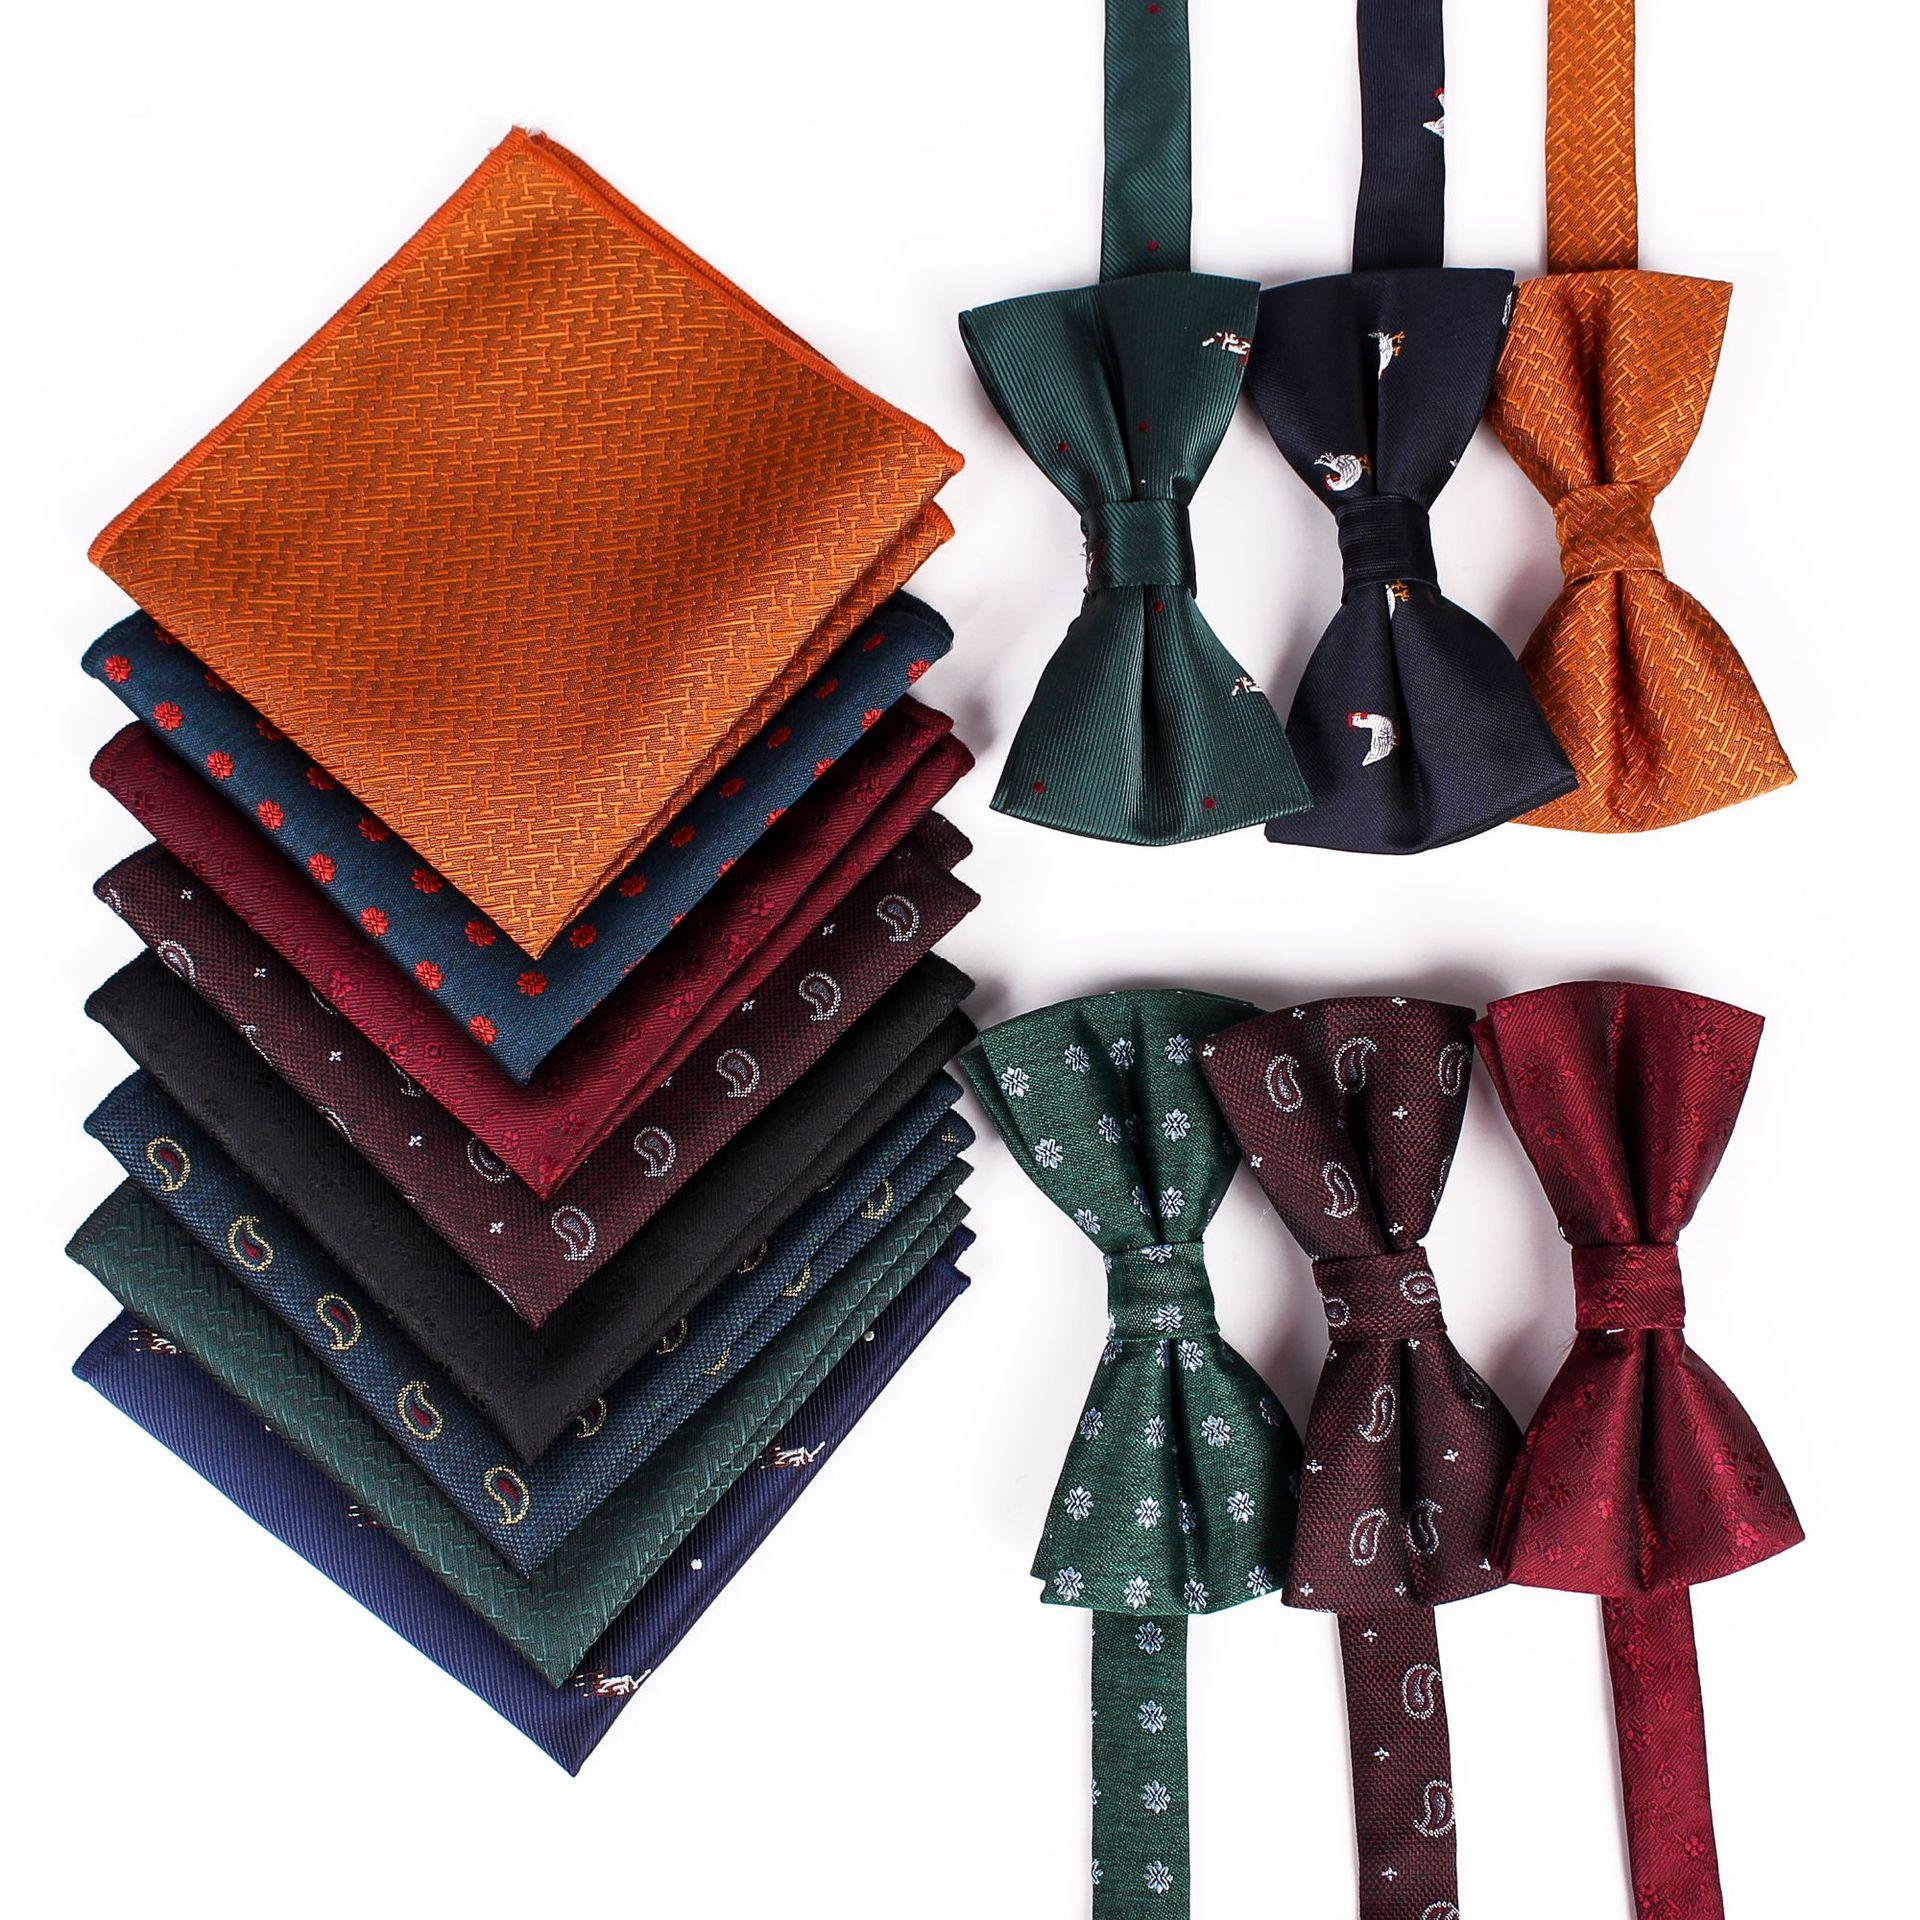 Upscale Mens Bow Tie Pocket Scarf Set Silk Jacquard Party Business Casual  Pocket Scarf Bowtie Wedding Prom Groomsmen Groom